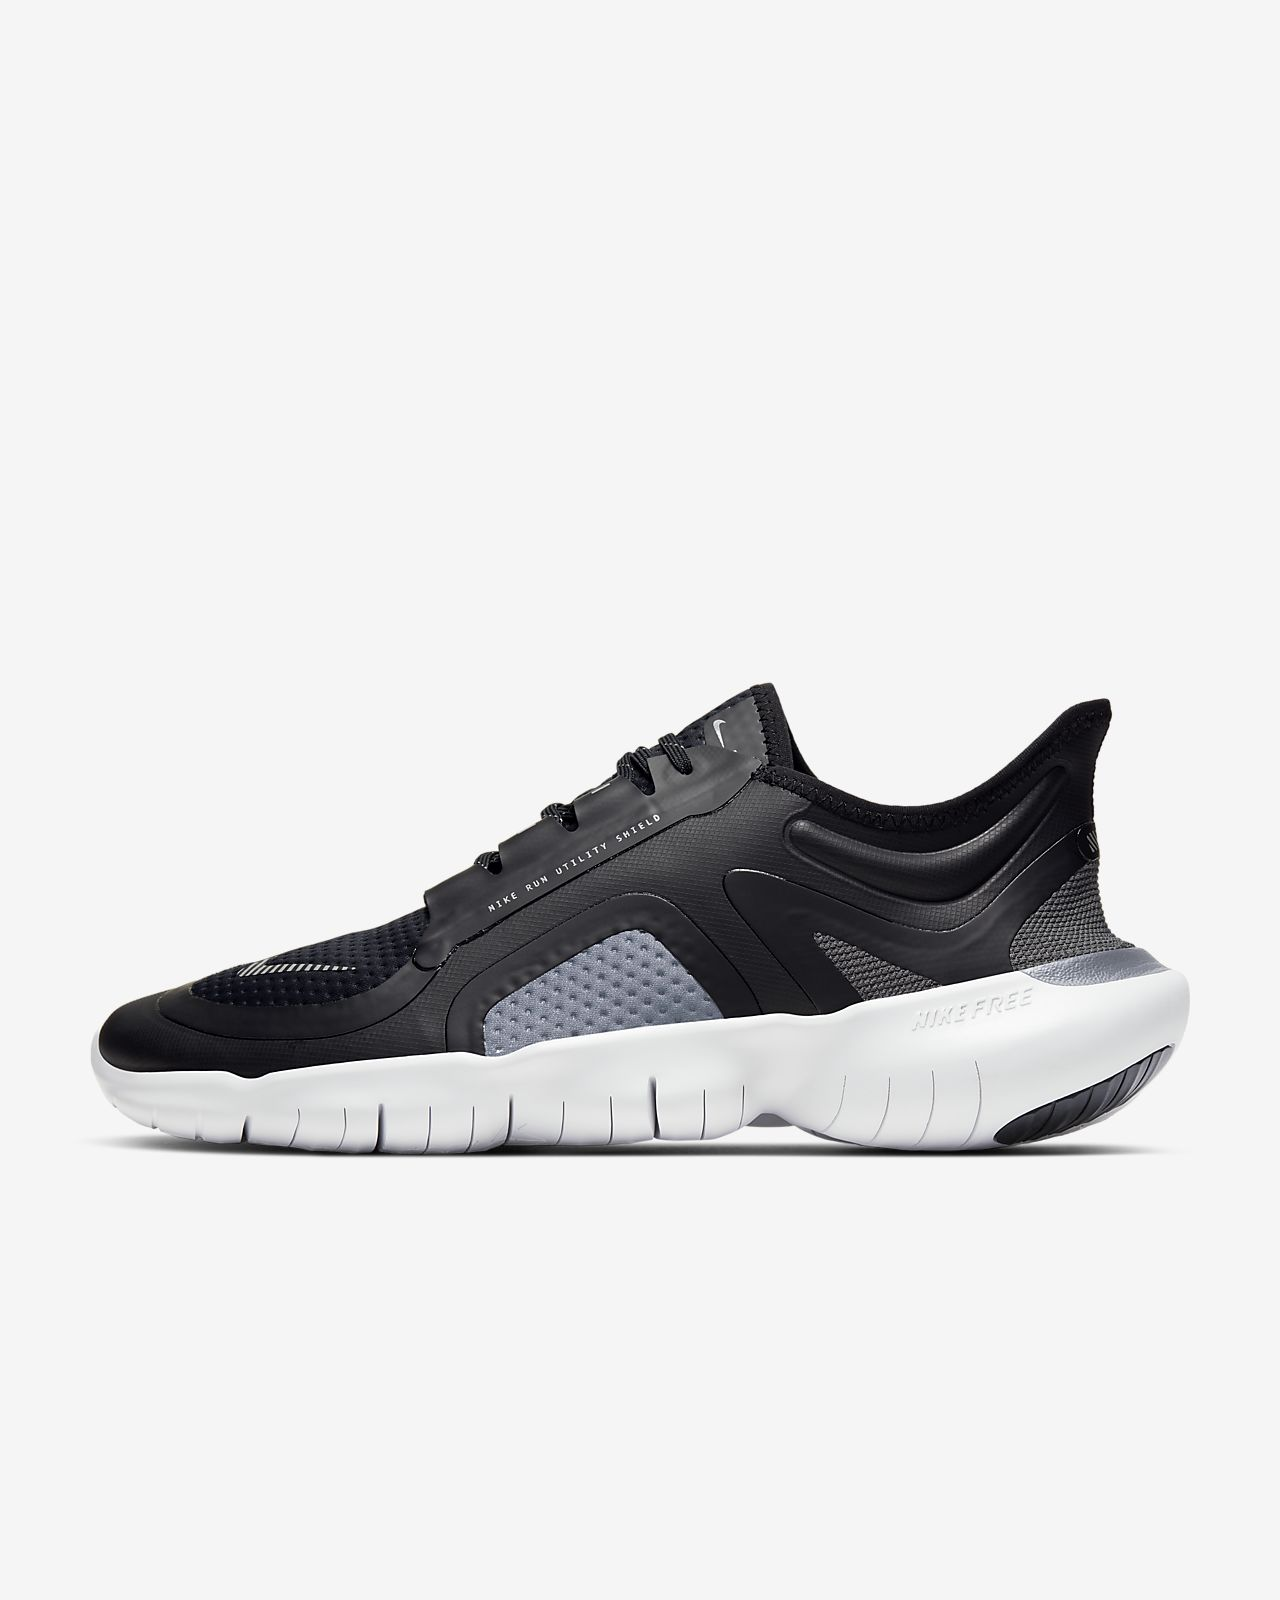 Nike Free RN 5,0 Shield Zapatillas de running Hombre